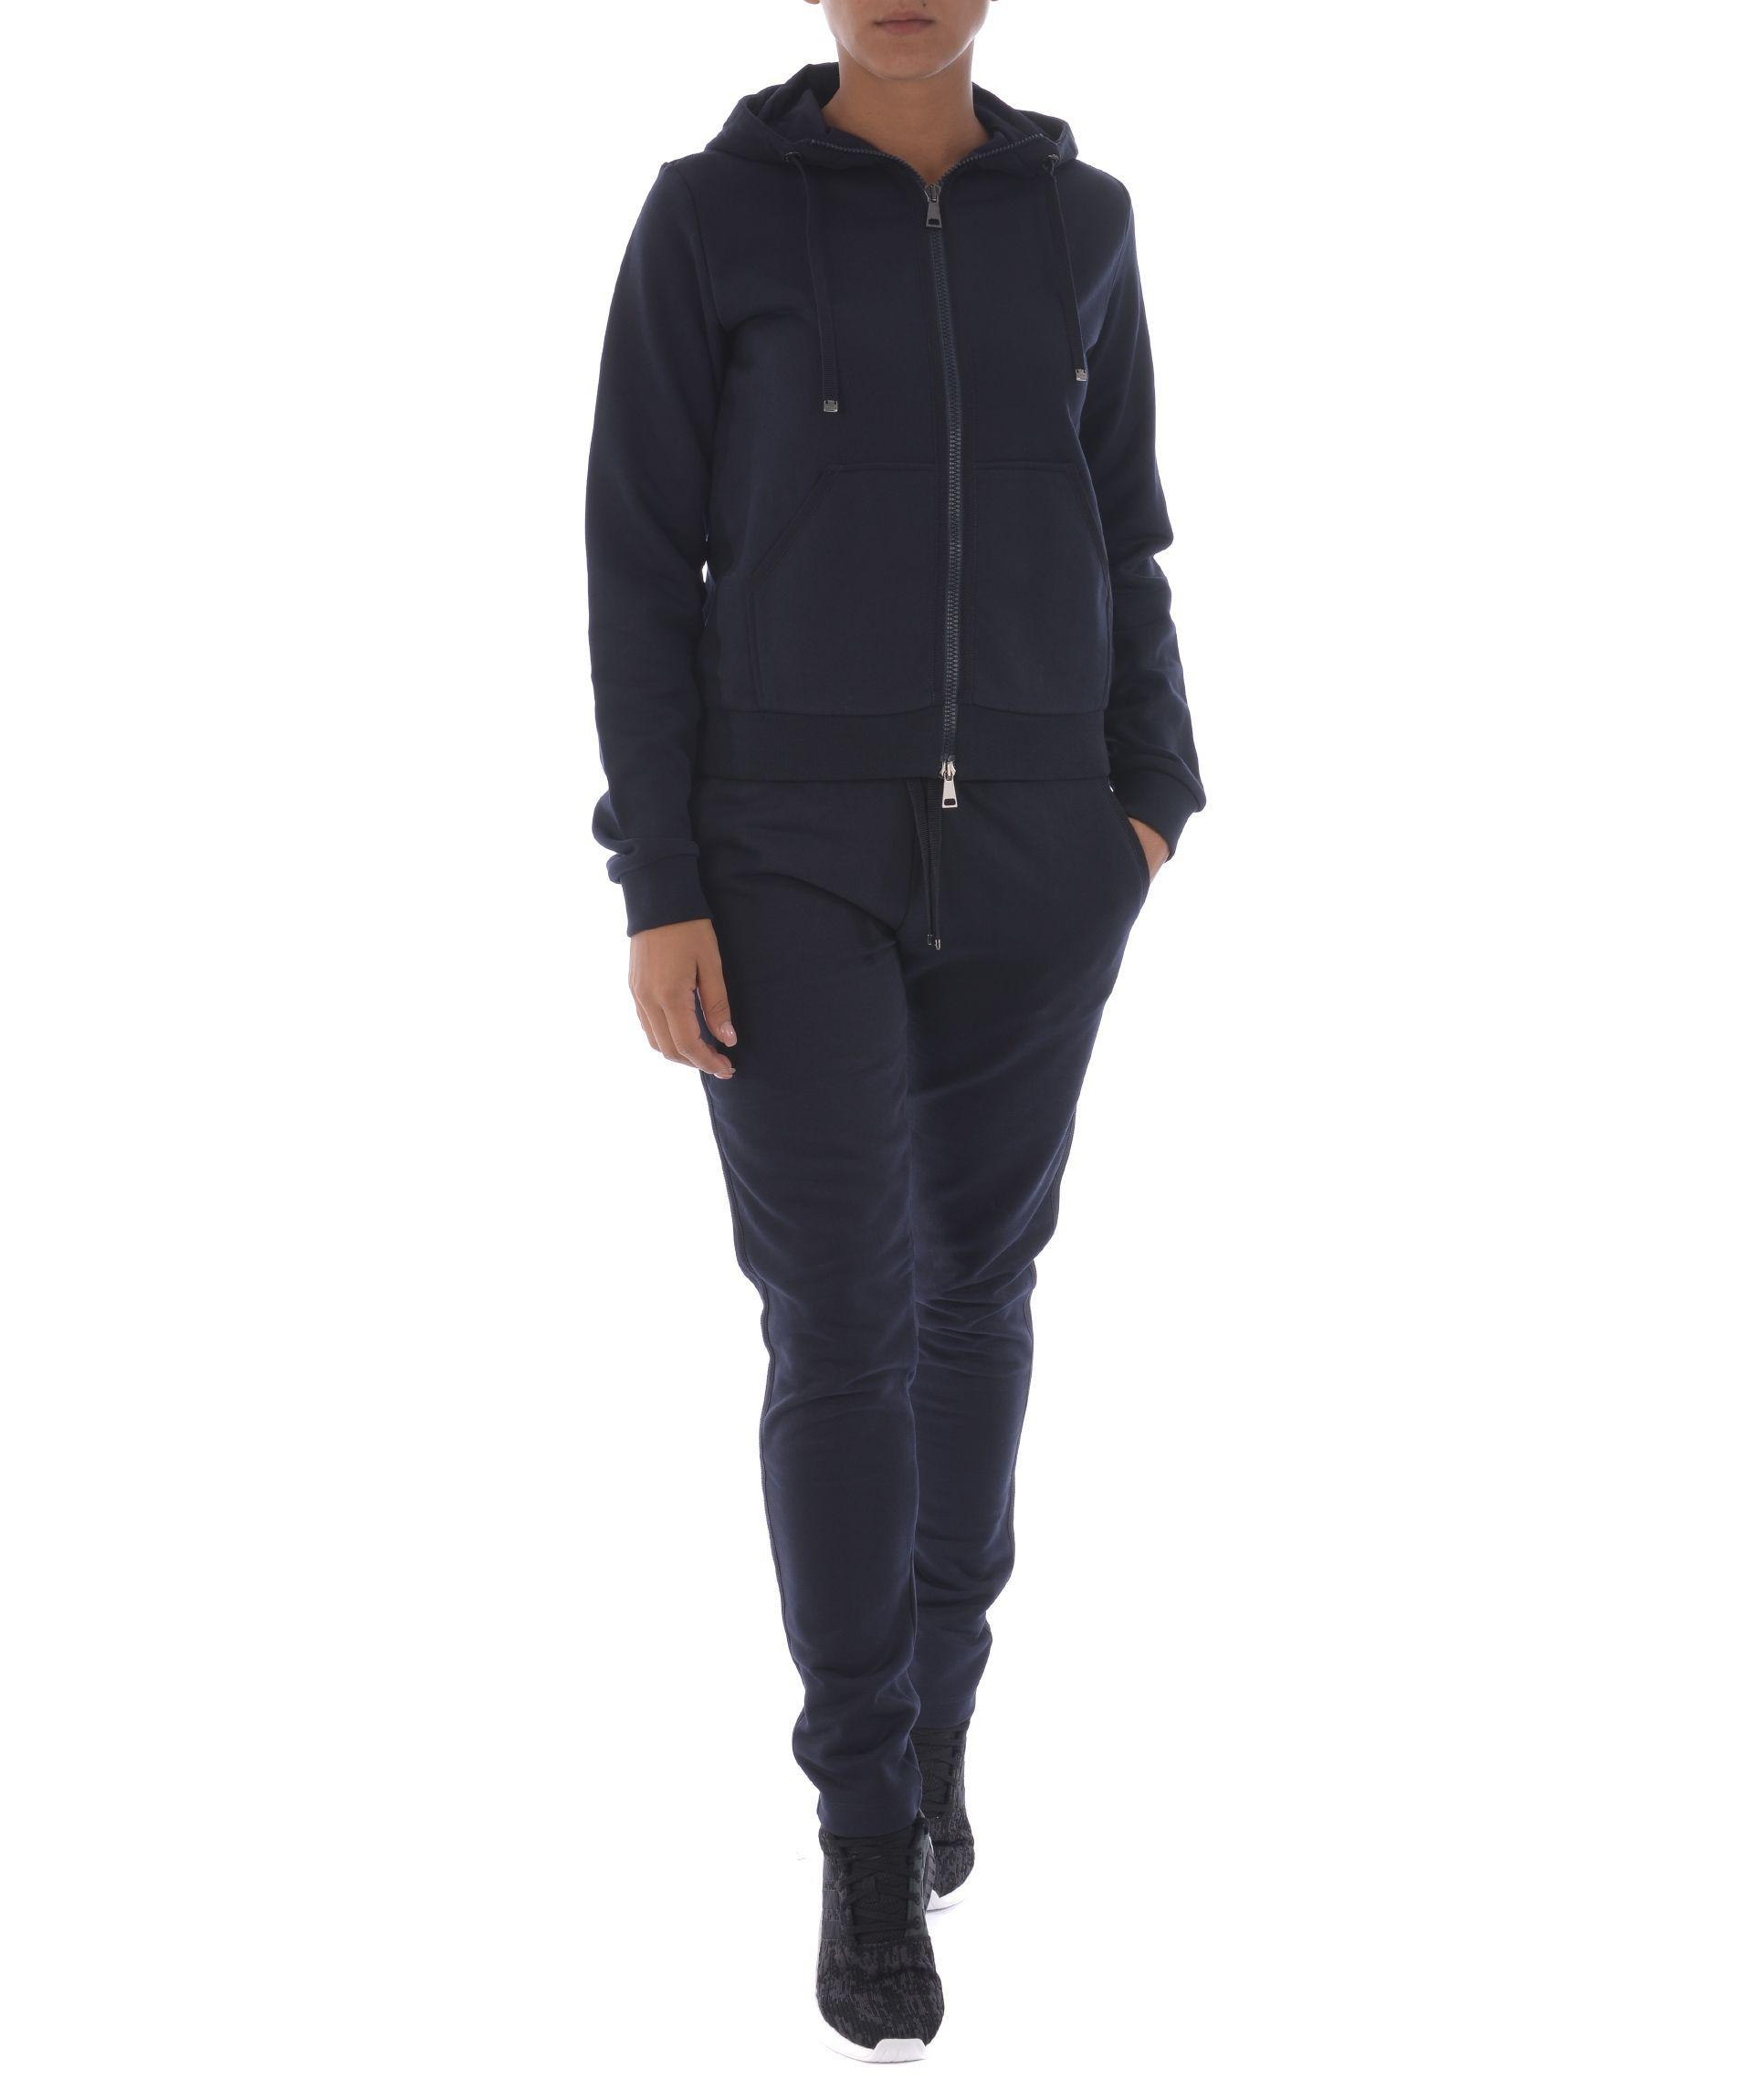 Moncler Zipped Hoodie In Blu Scuro